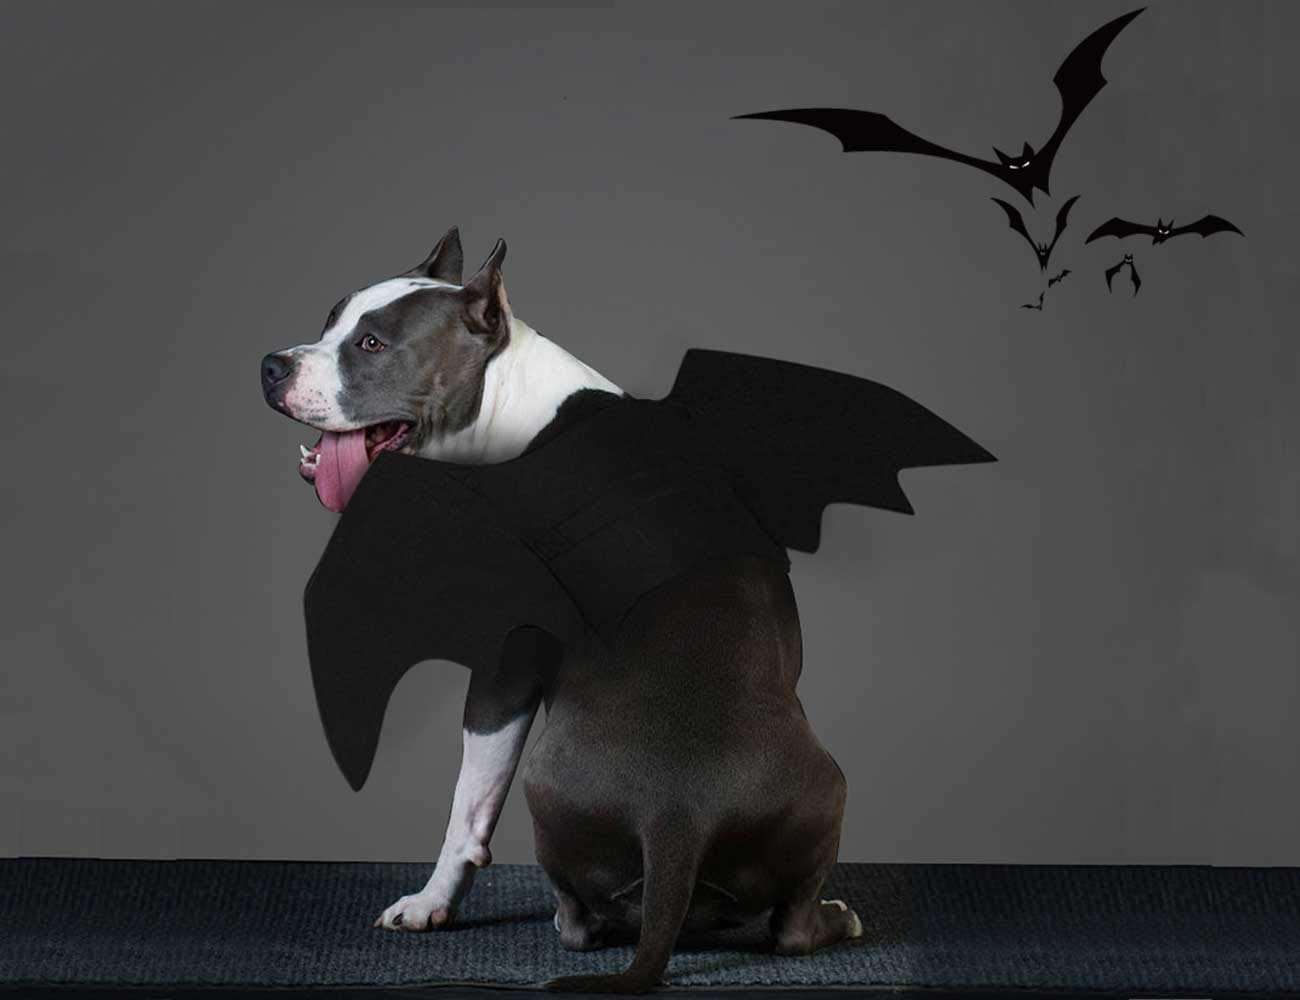 M ALIOO Pet Bat Wings Dog Cat Christmas Adorable Costume Xmas Gift